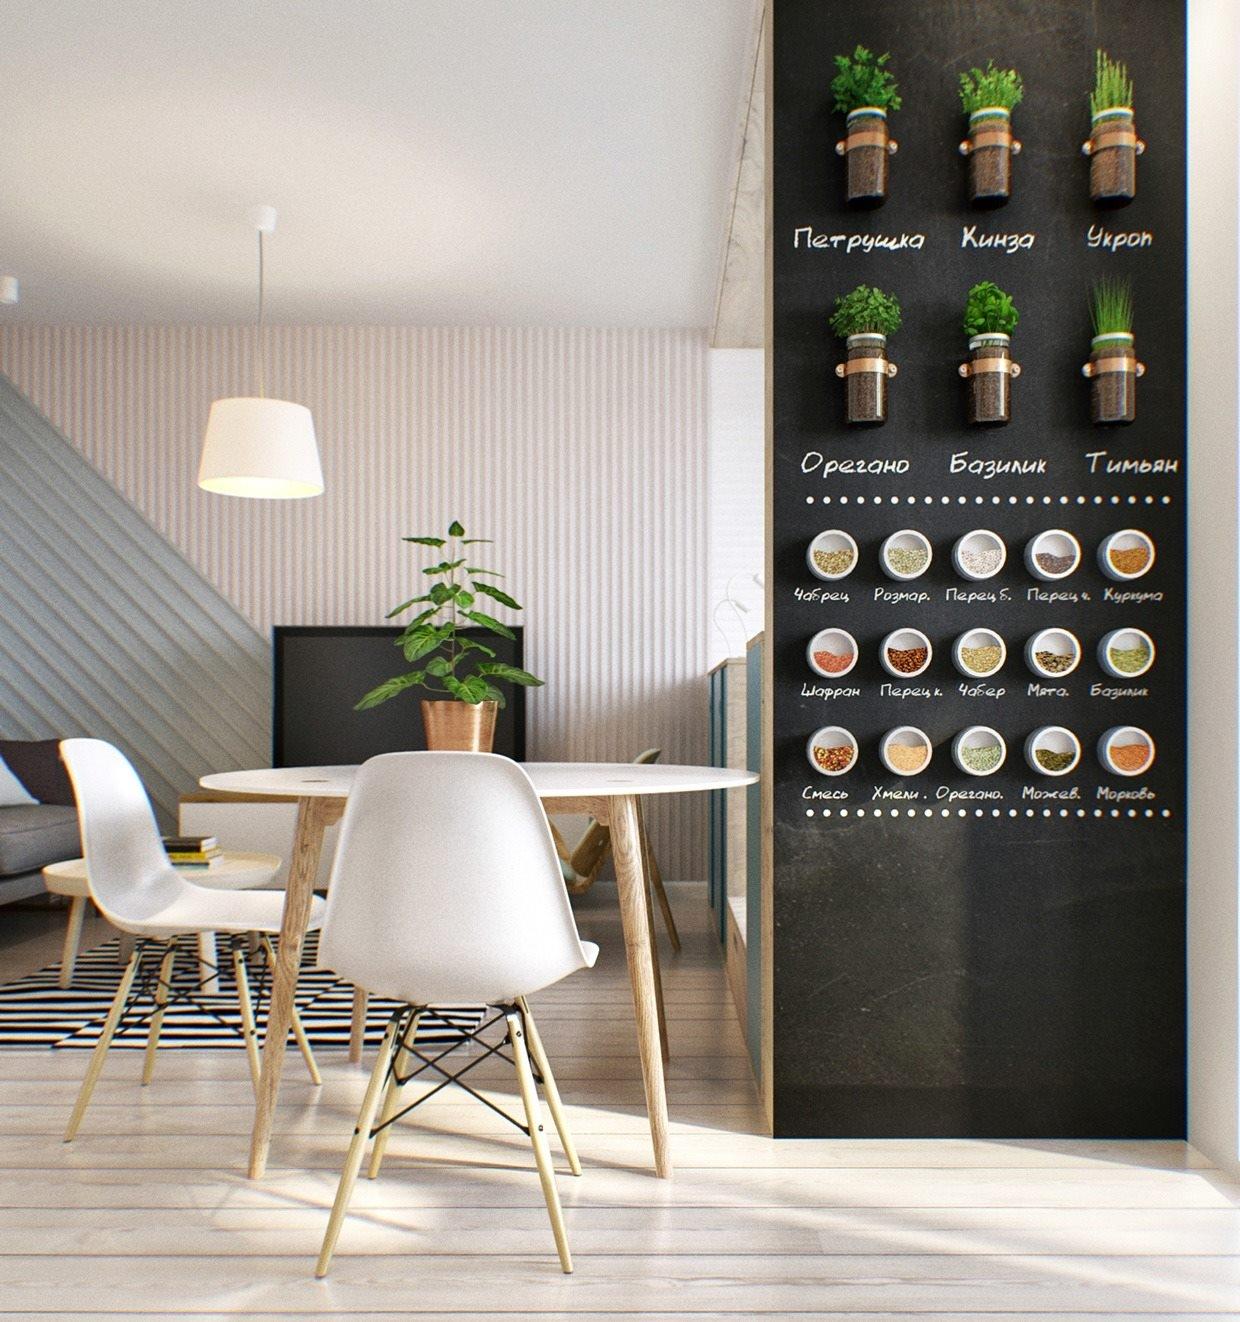 Famoso Best Parete Lavagna Cucina Gallery - bakeroffroad.us - bakeroffroad.us AW42